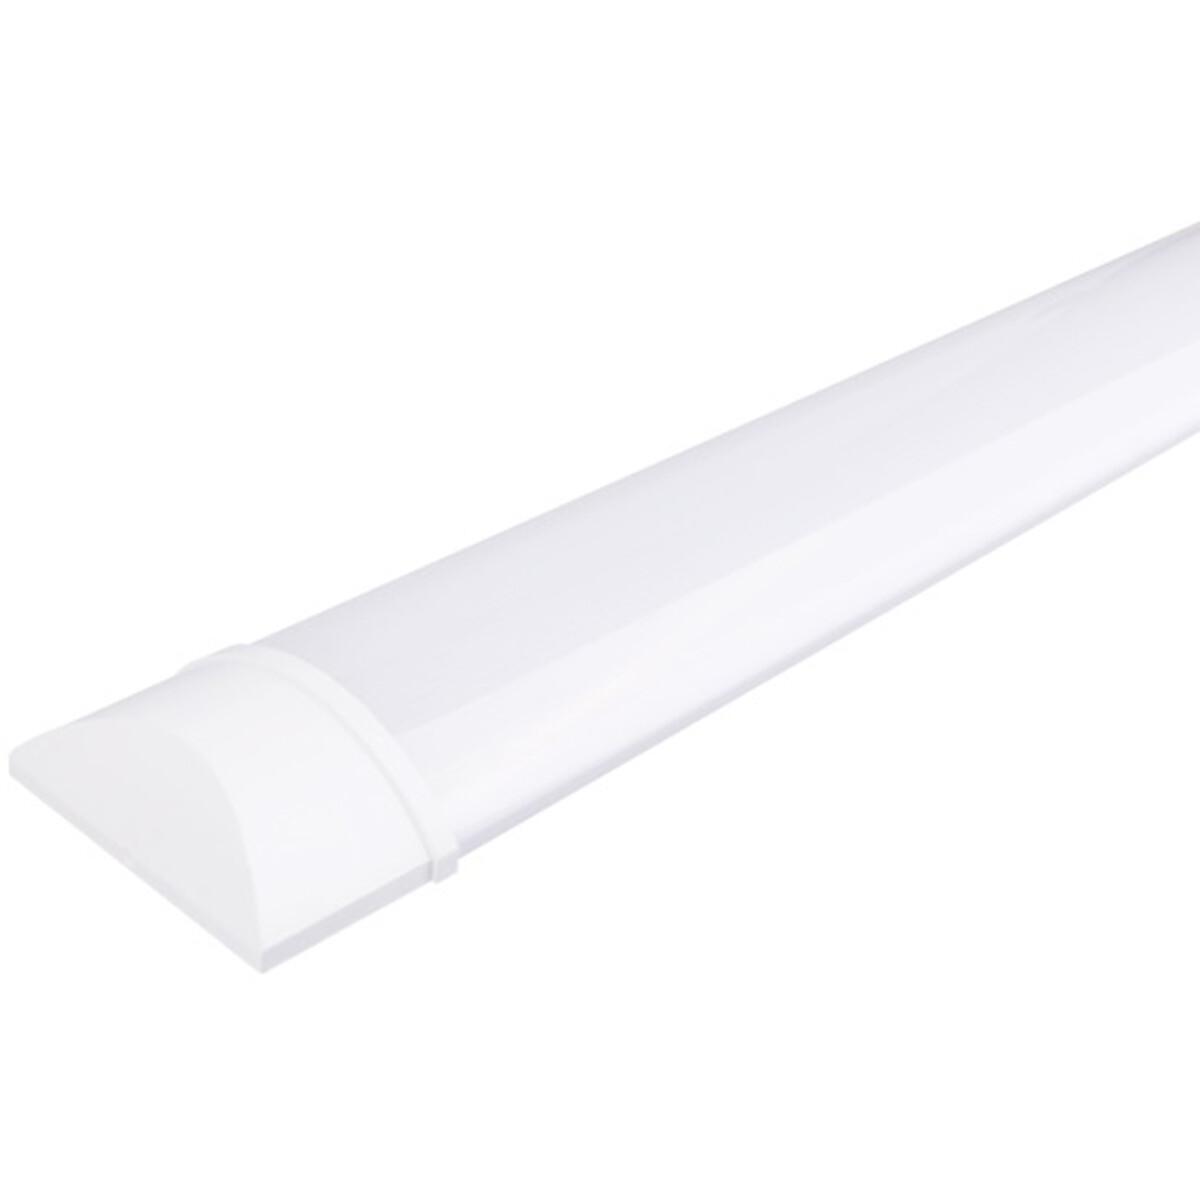 LED Balk - Aigi Tynom - 20W - Natuurlijk Wit 4000K - Mat Wit - Kunststof - 60cm